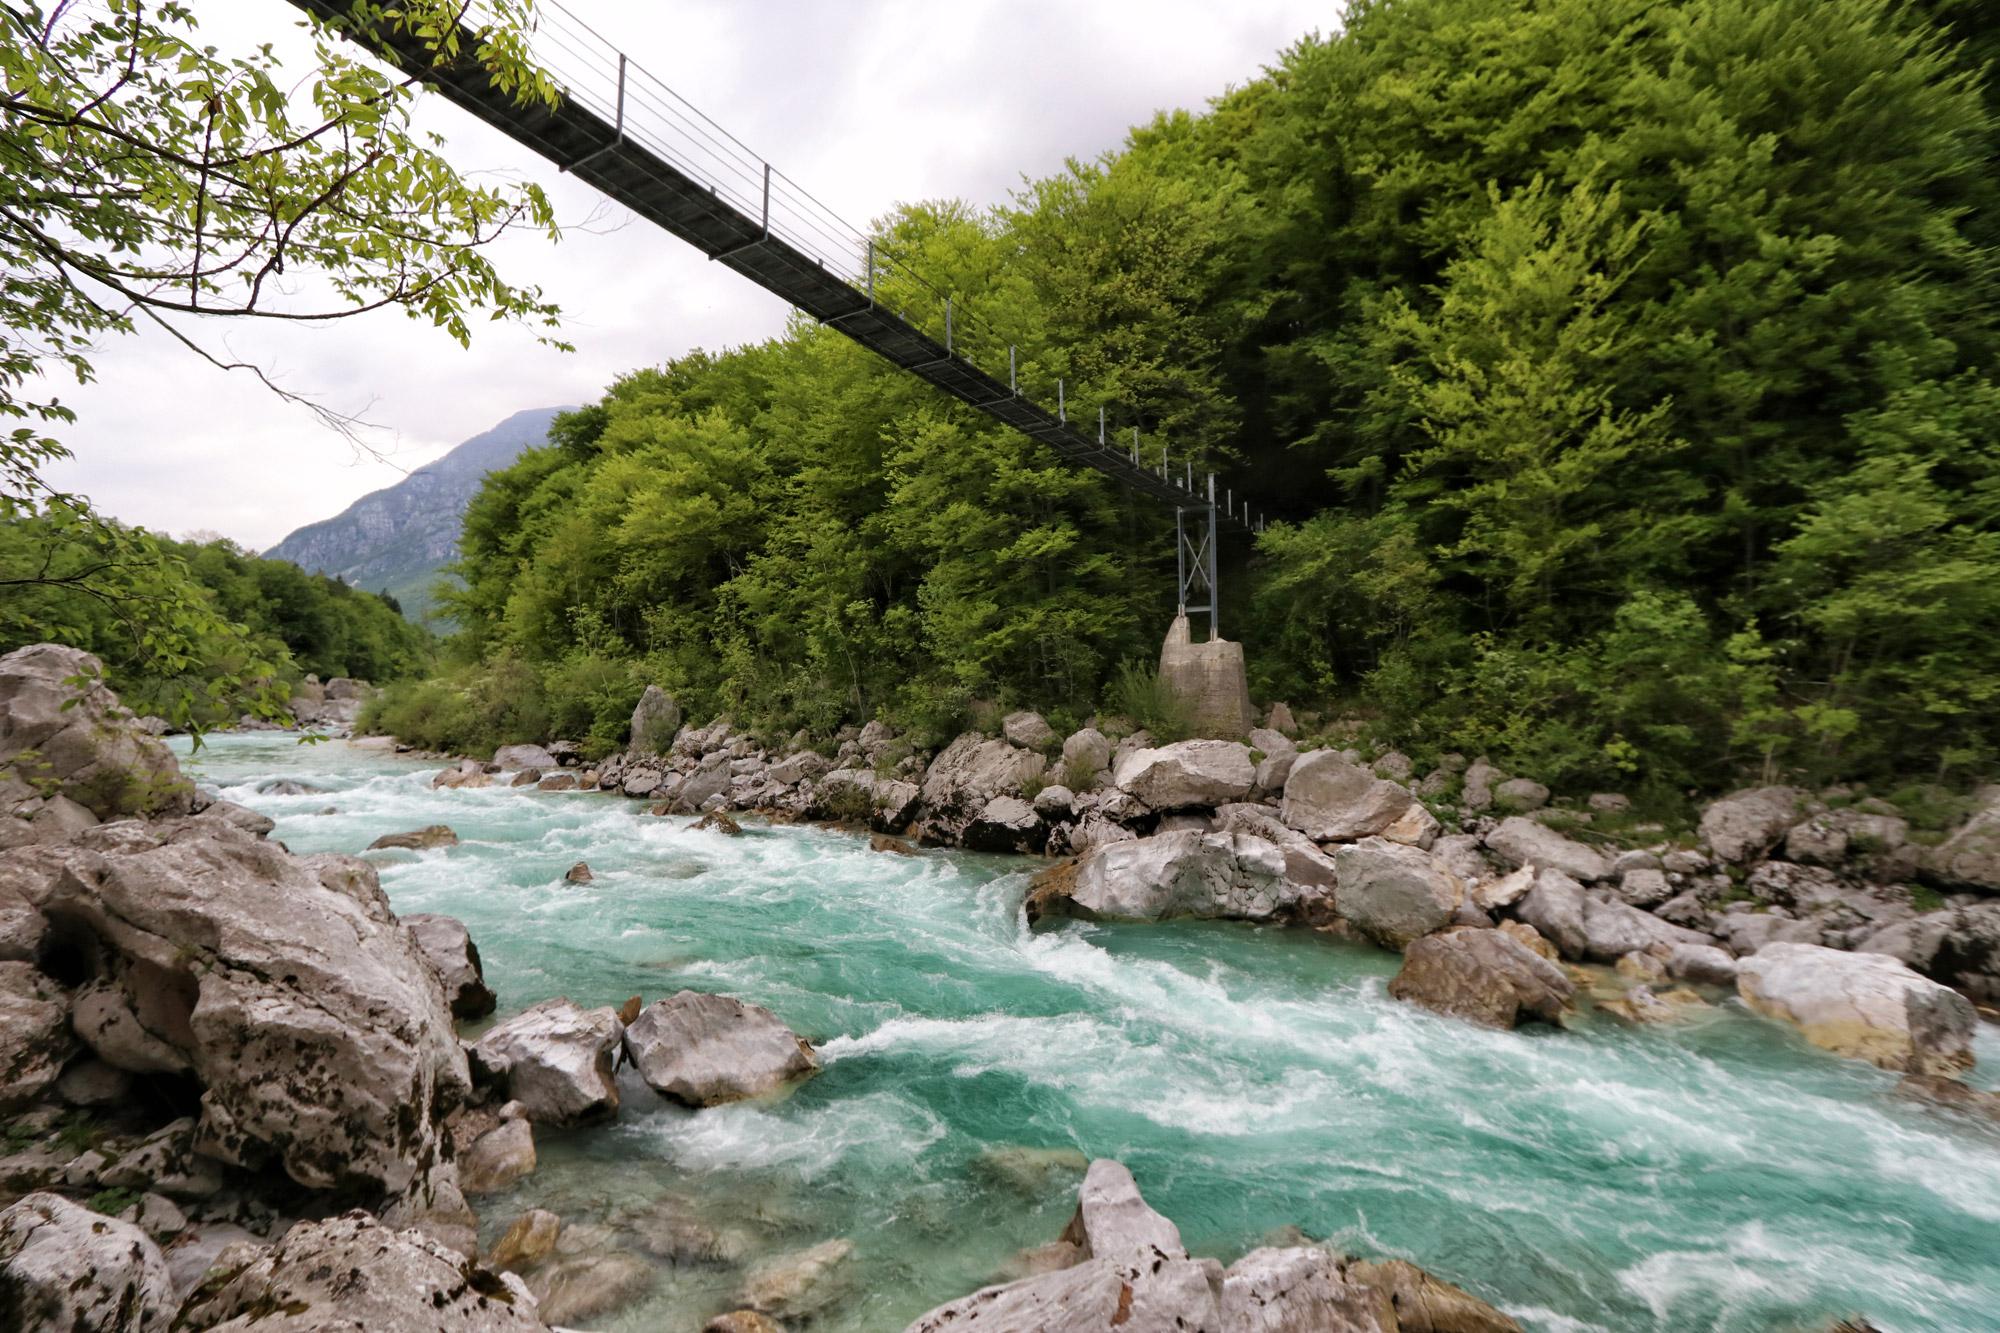 Soška pot wandeling in Slovenië - Brug over de Soča rivier